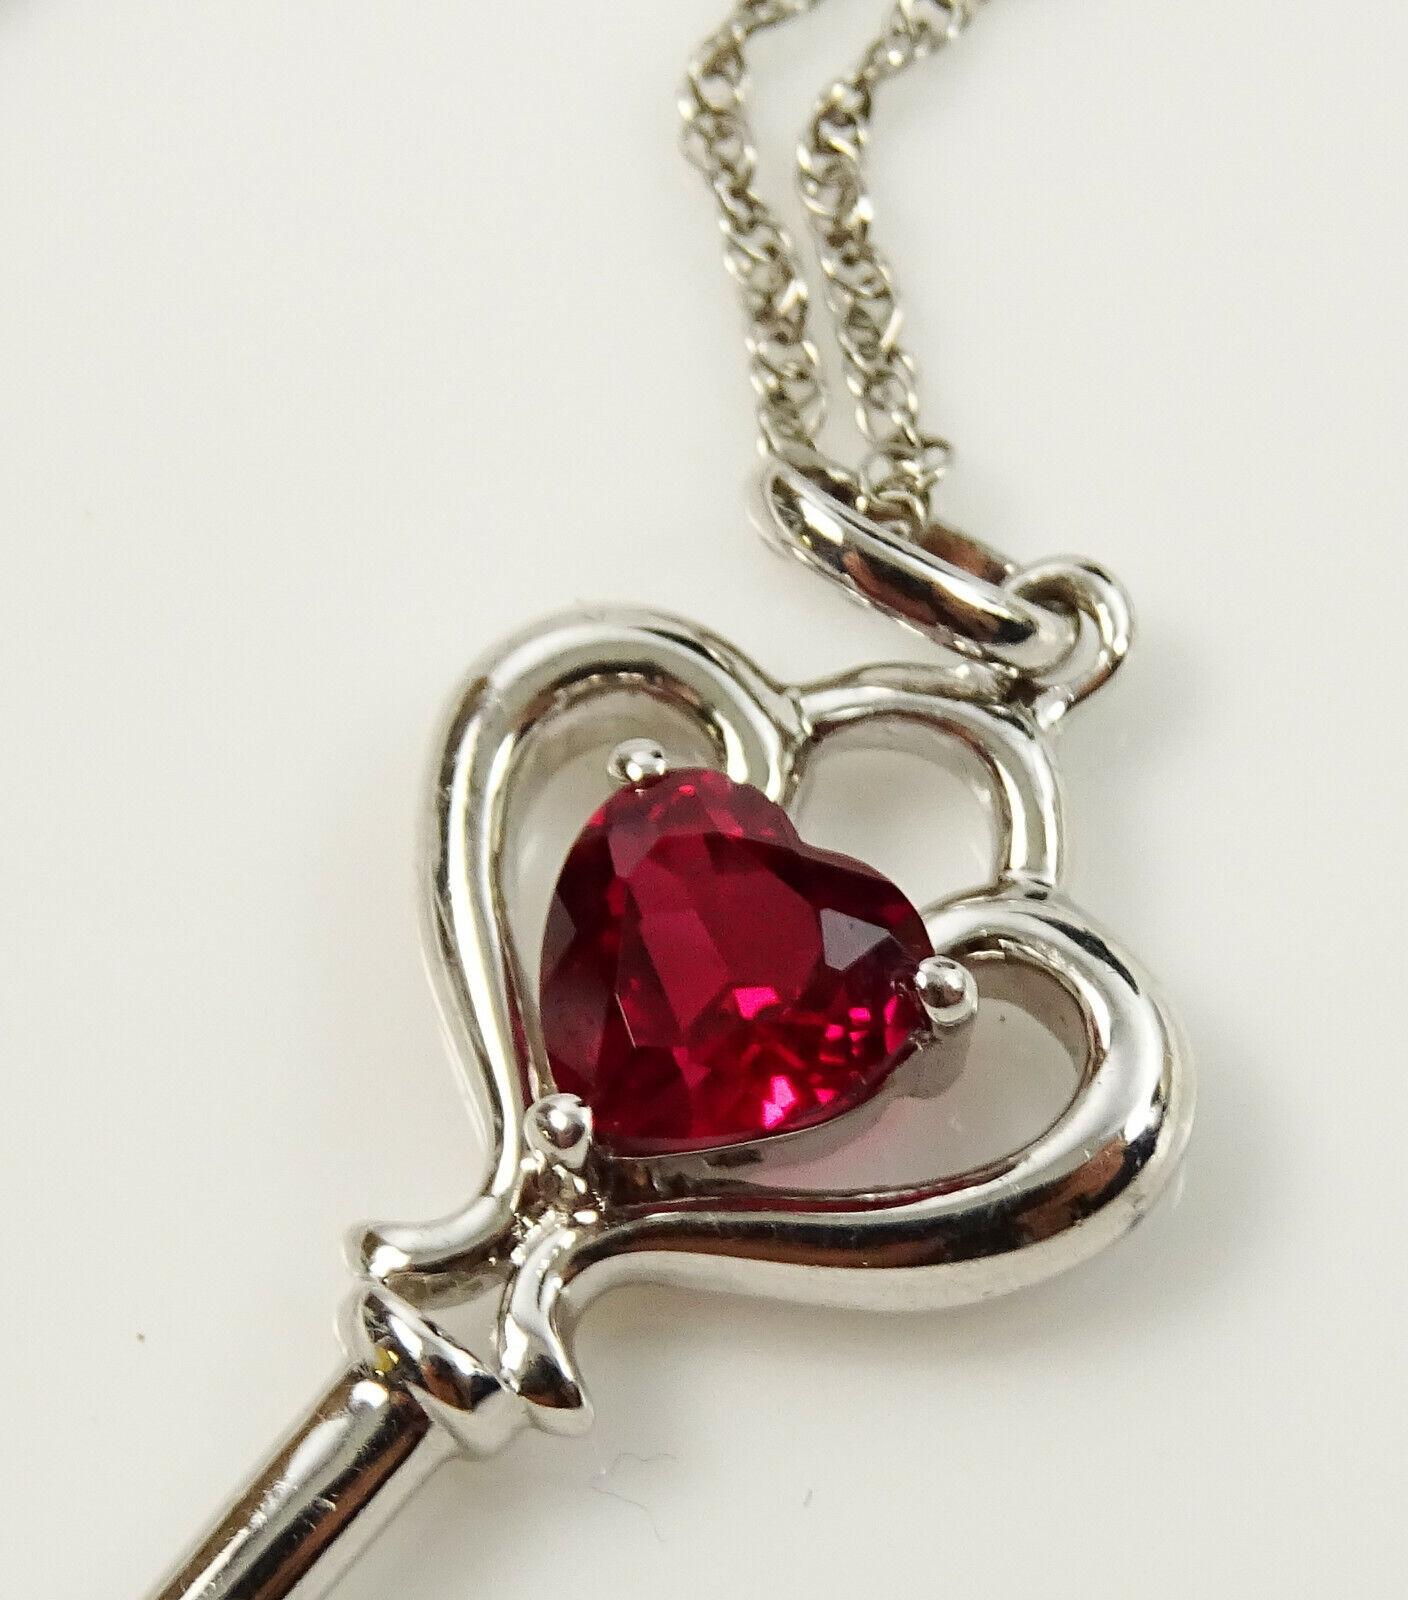 Red Onyx Pendant Designer Pendant 6935 mm Christmas Sale 925 Silver Plated Gemstone Pendant